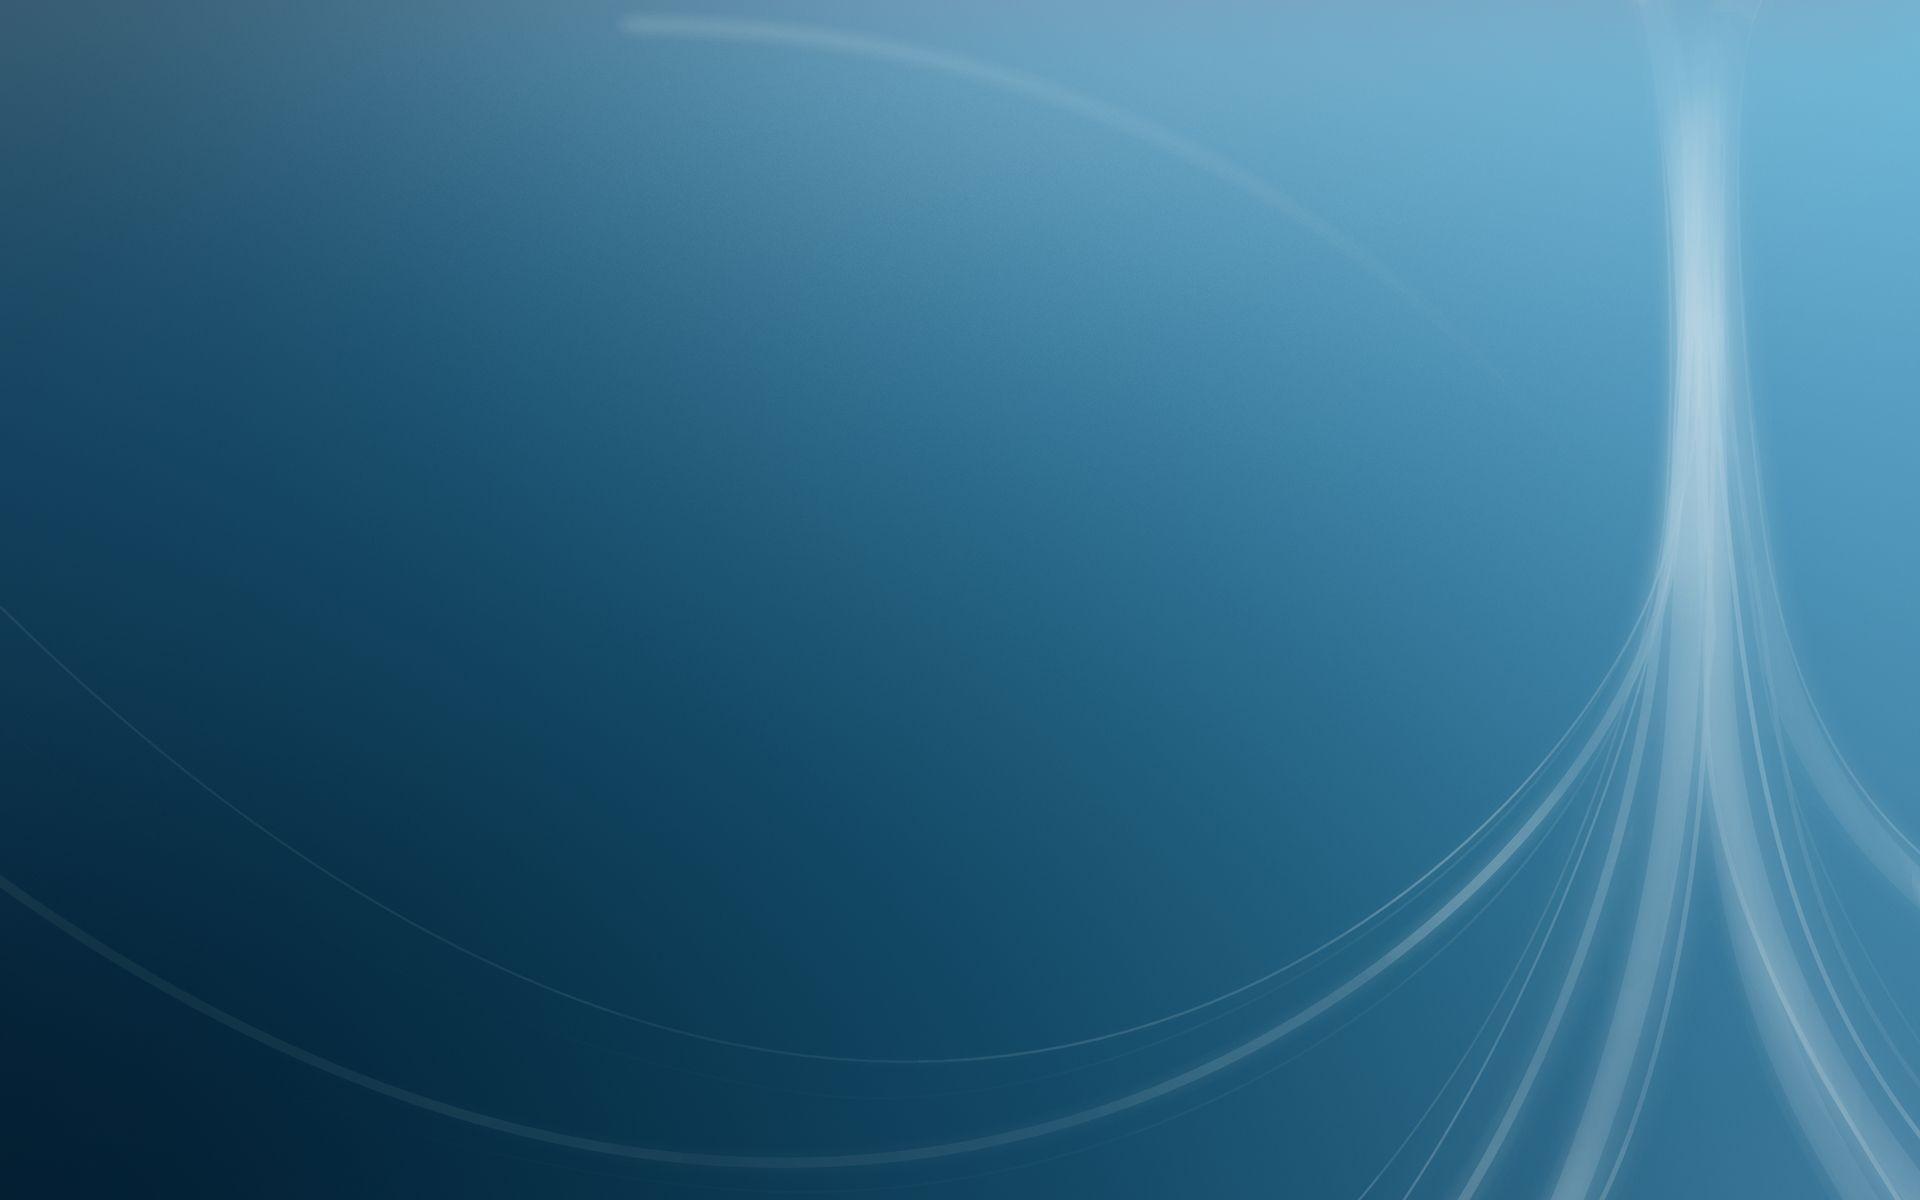 linux fedora wallpaper - photo #28